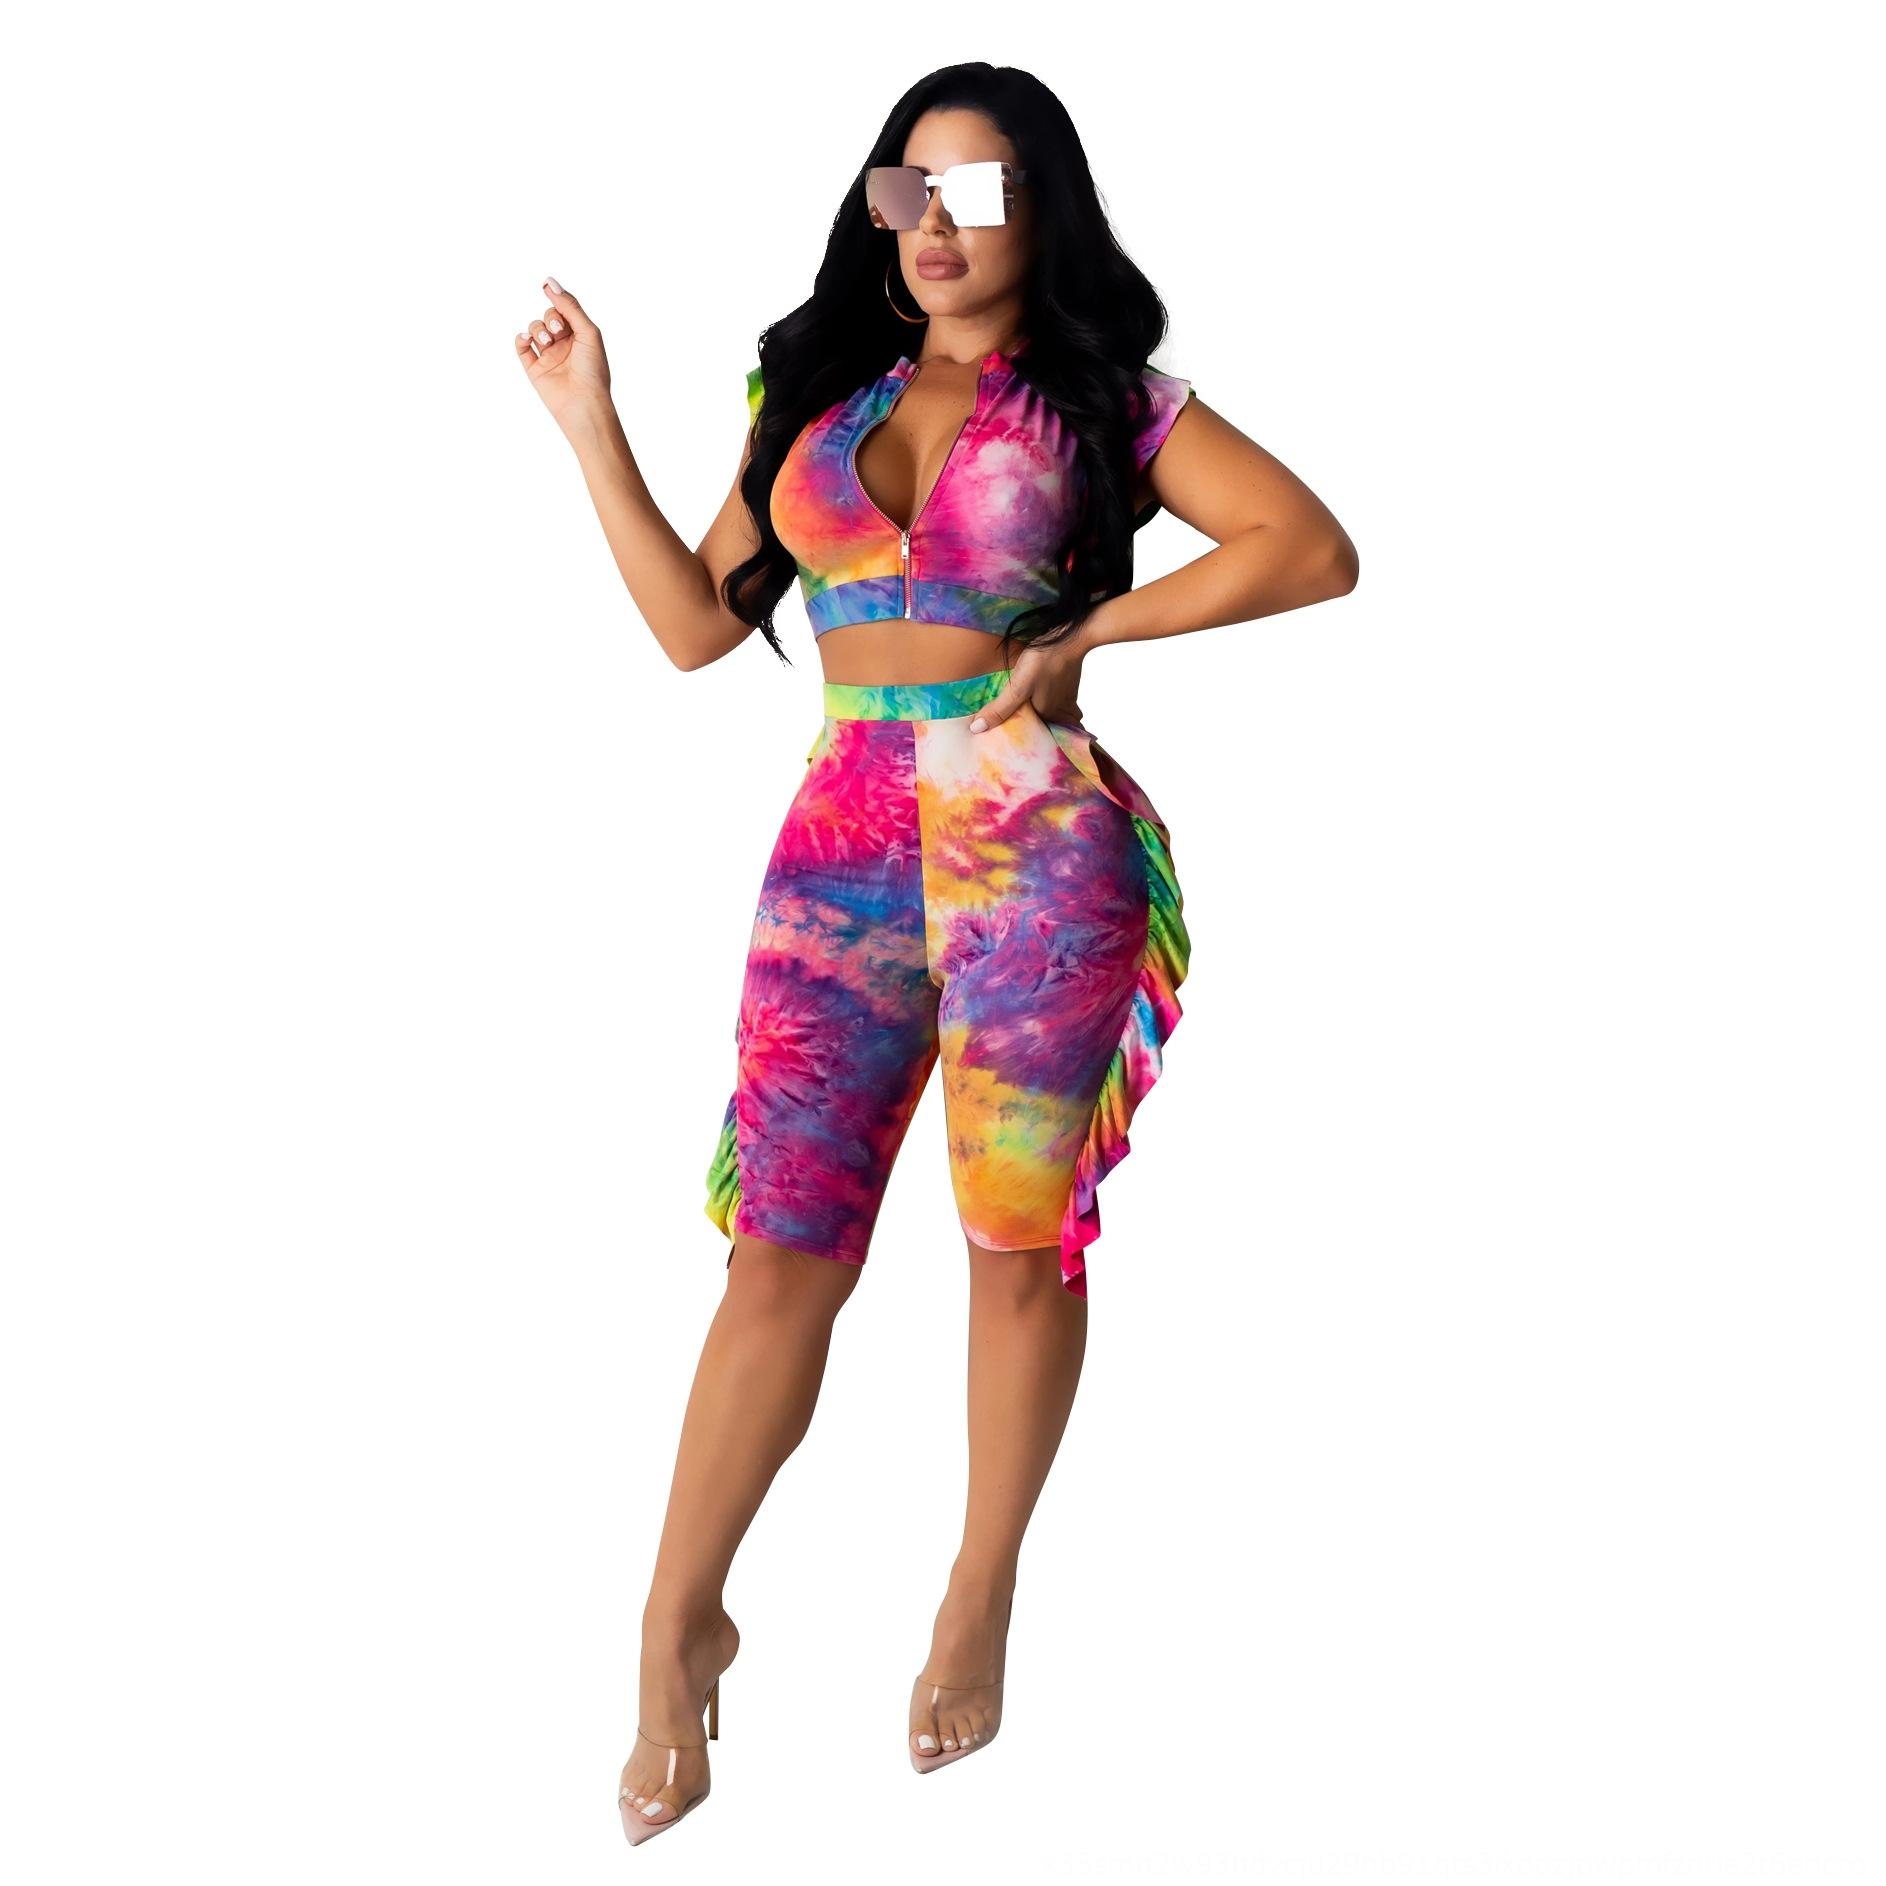 waFnT 2020 new printed cardigan Fashion suit 2020 new women's printed women's cardigan shorts Fashion Shorts digital Digital suit